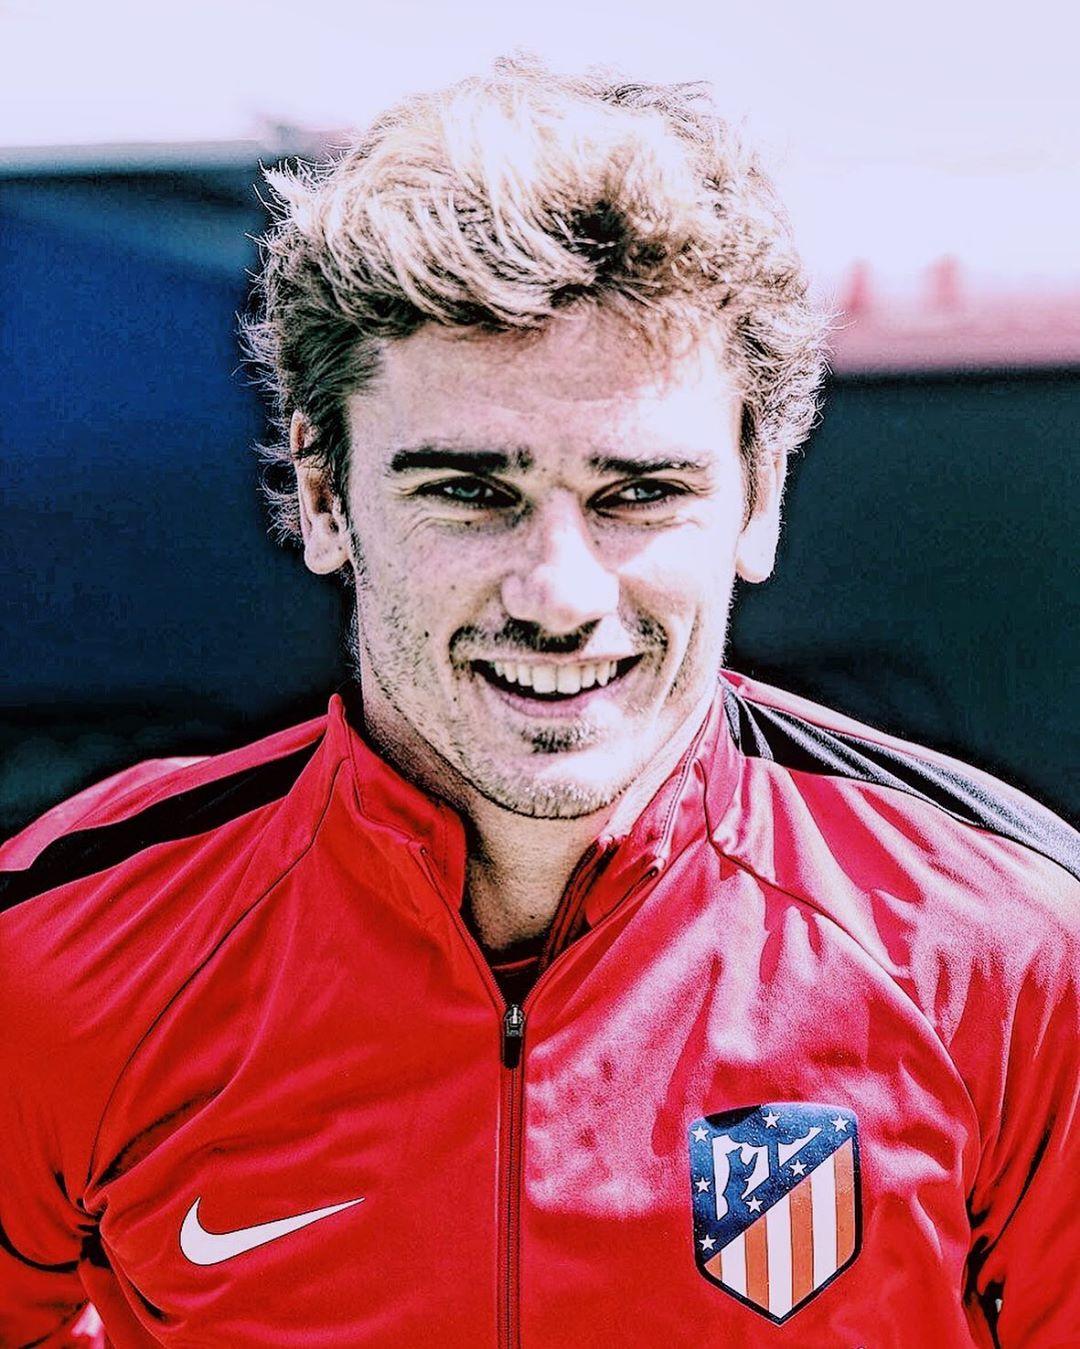 Antoine Griezmann สำหรับ Atletico Madrid ️ 5 ปี 256 เกม ️ 133 เป้าหมาย🅰️ …